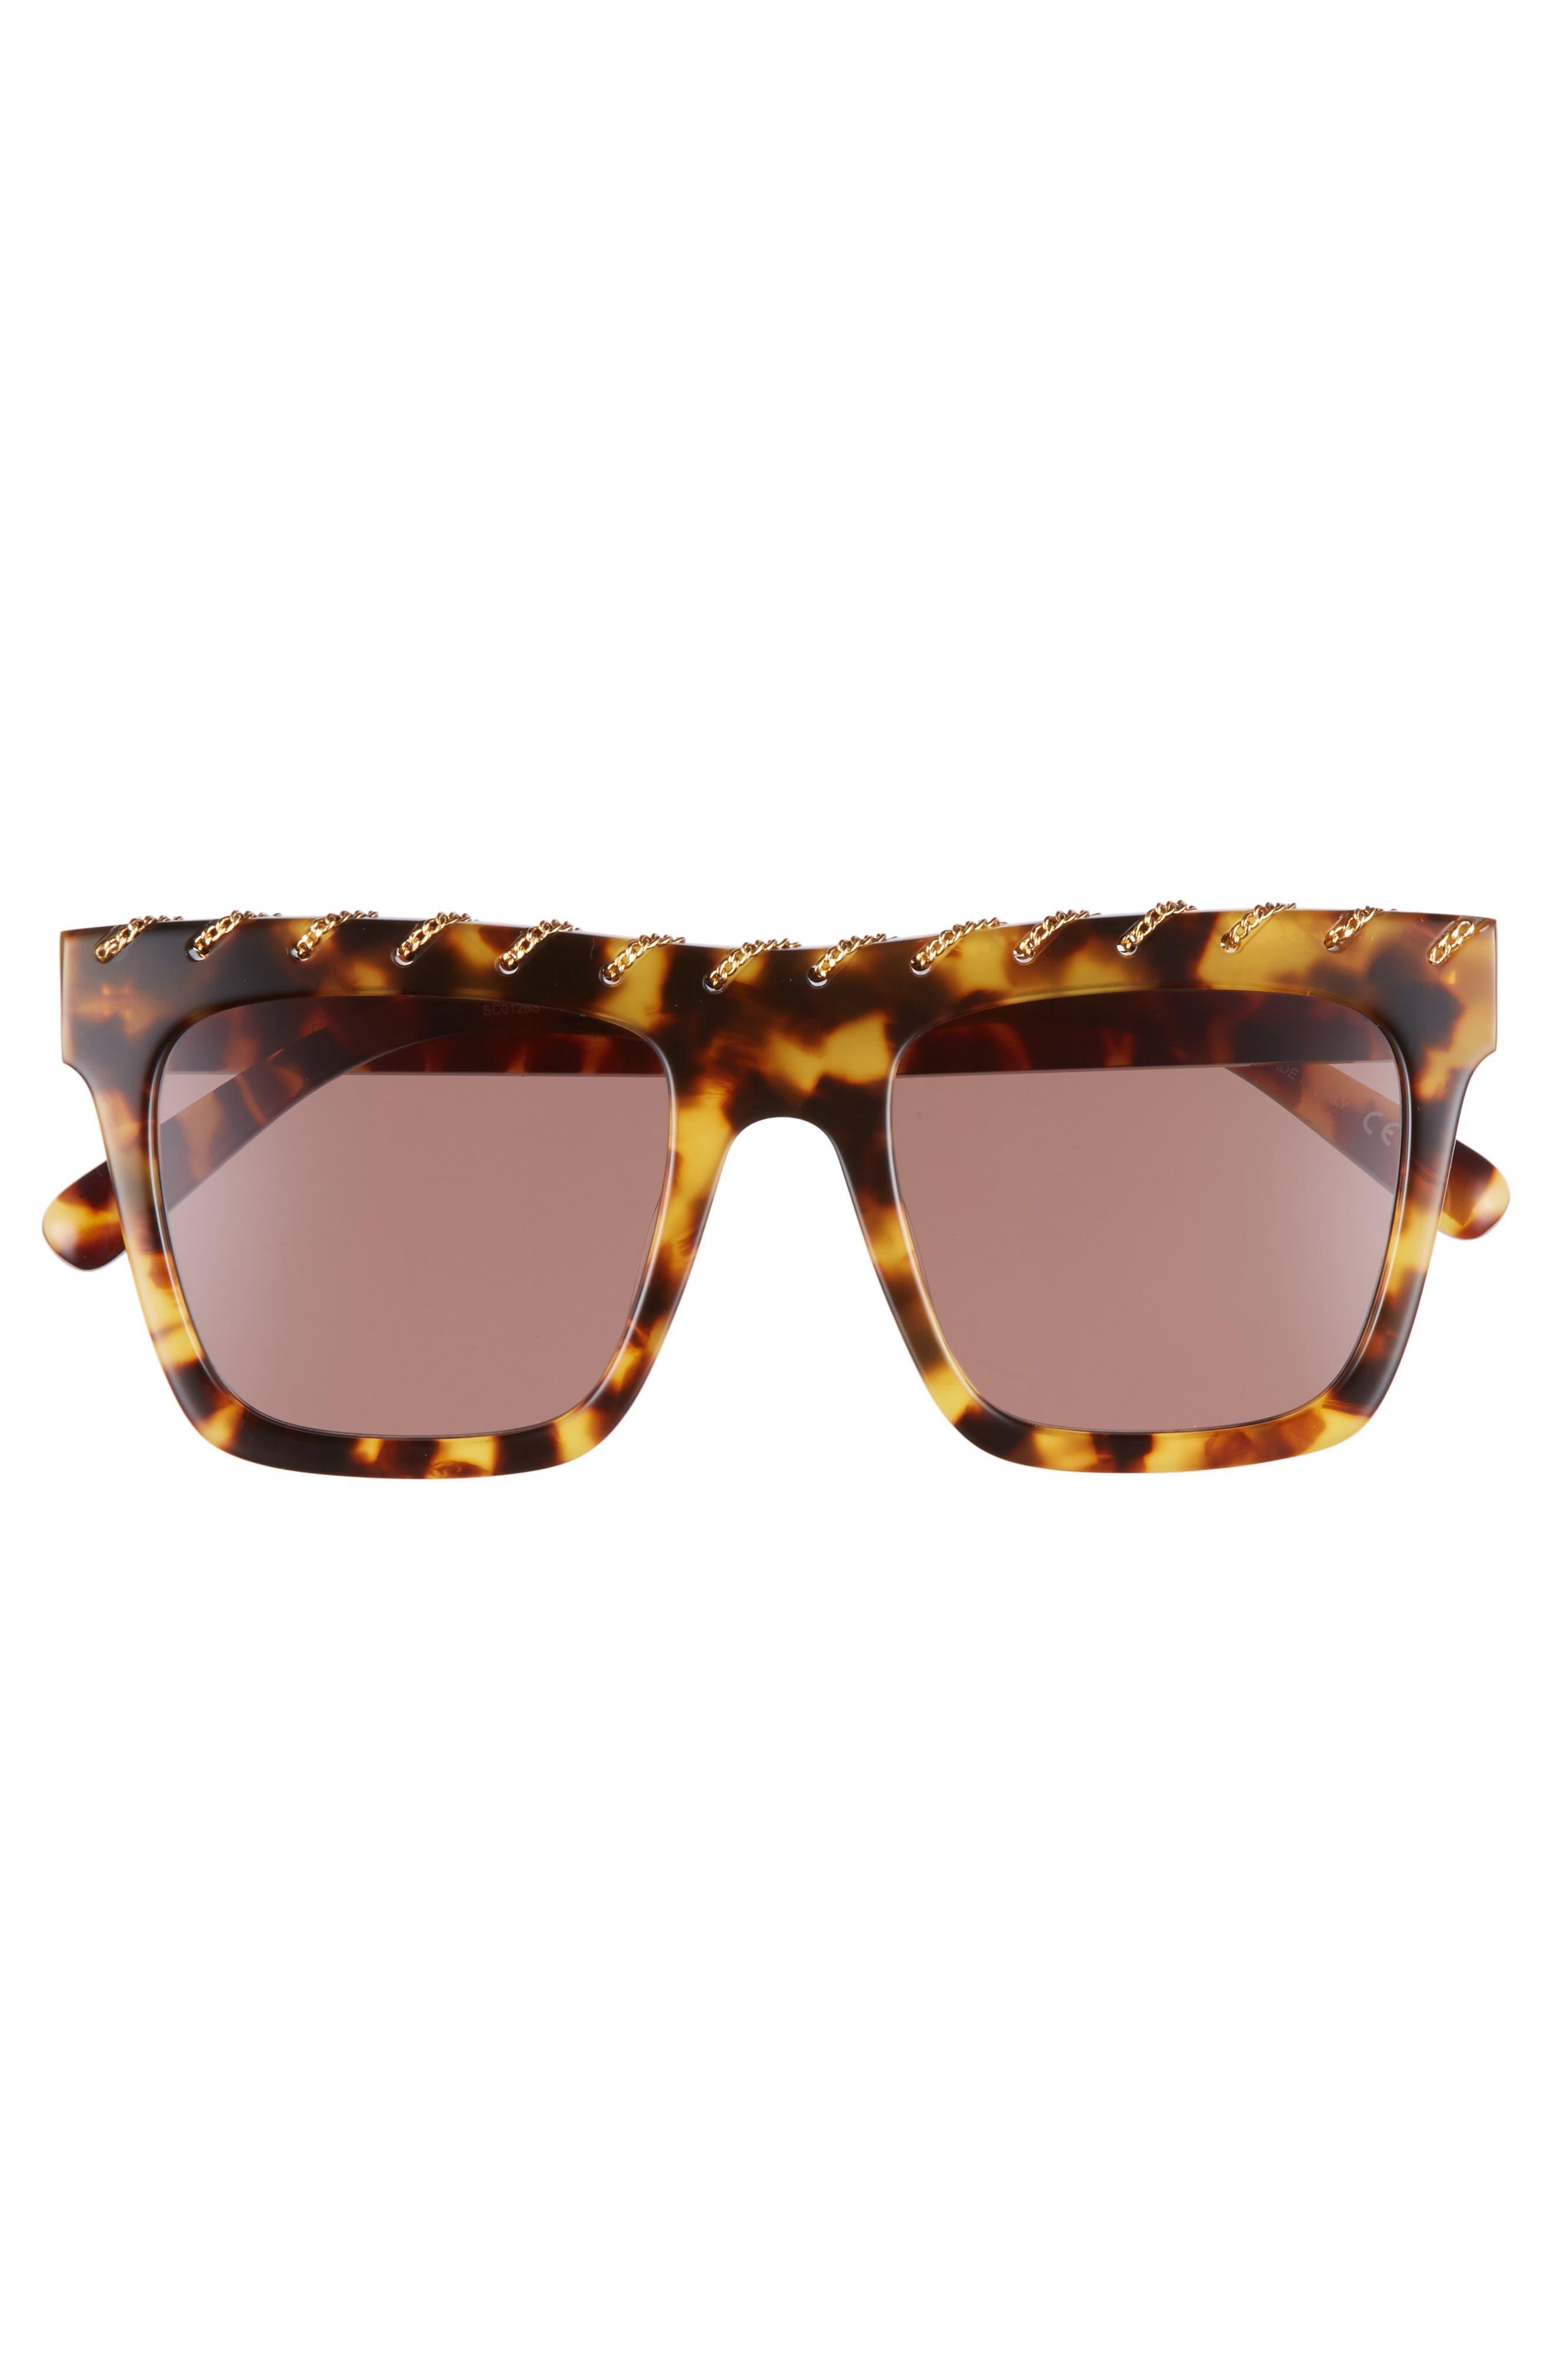 51mm Chain Detail Square Sunglasses,                             Alternate thumbnail 3, color,                             212